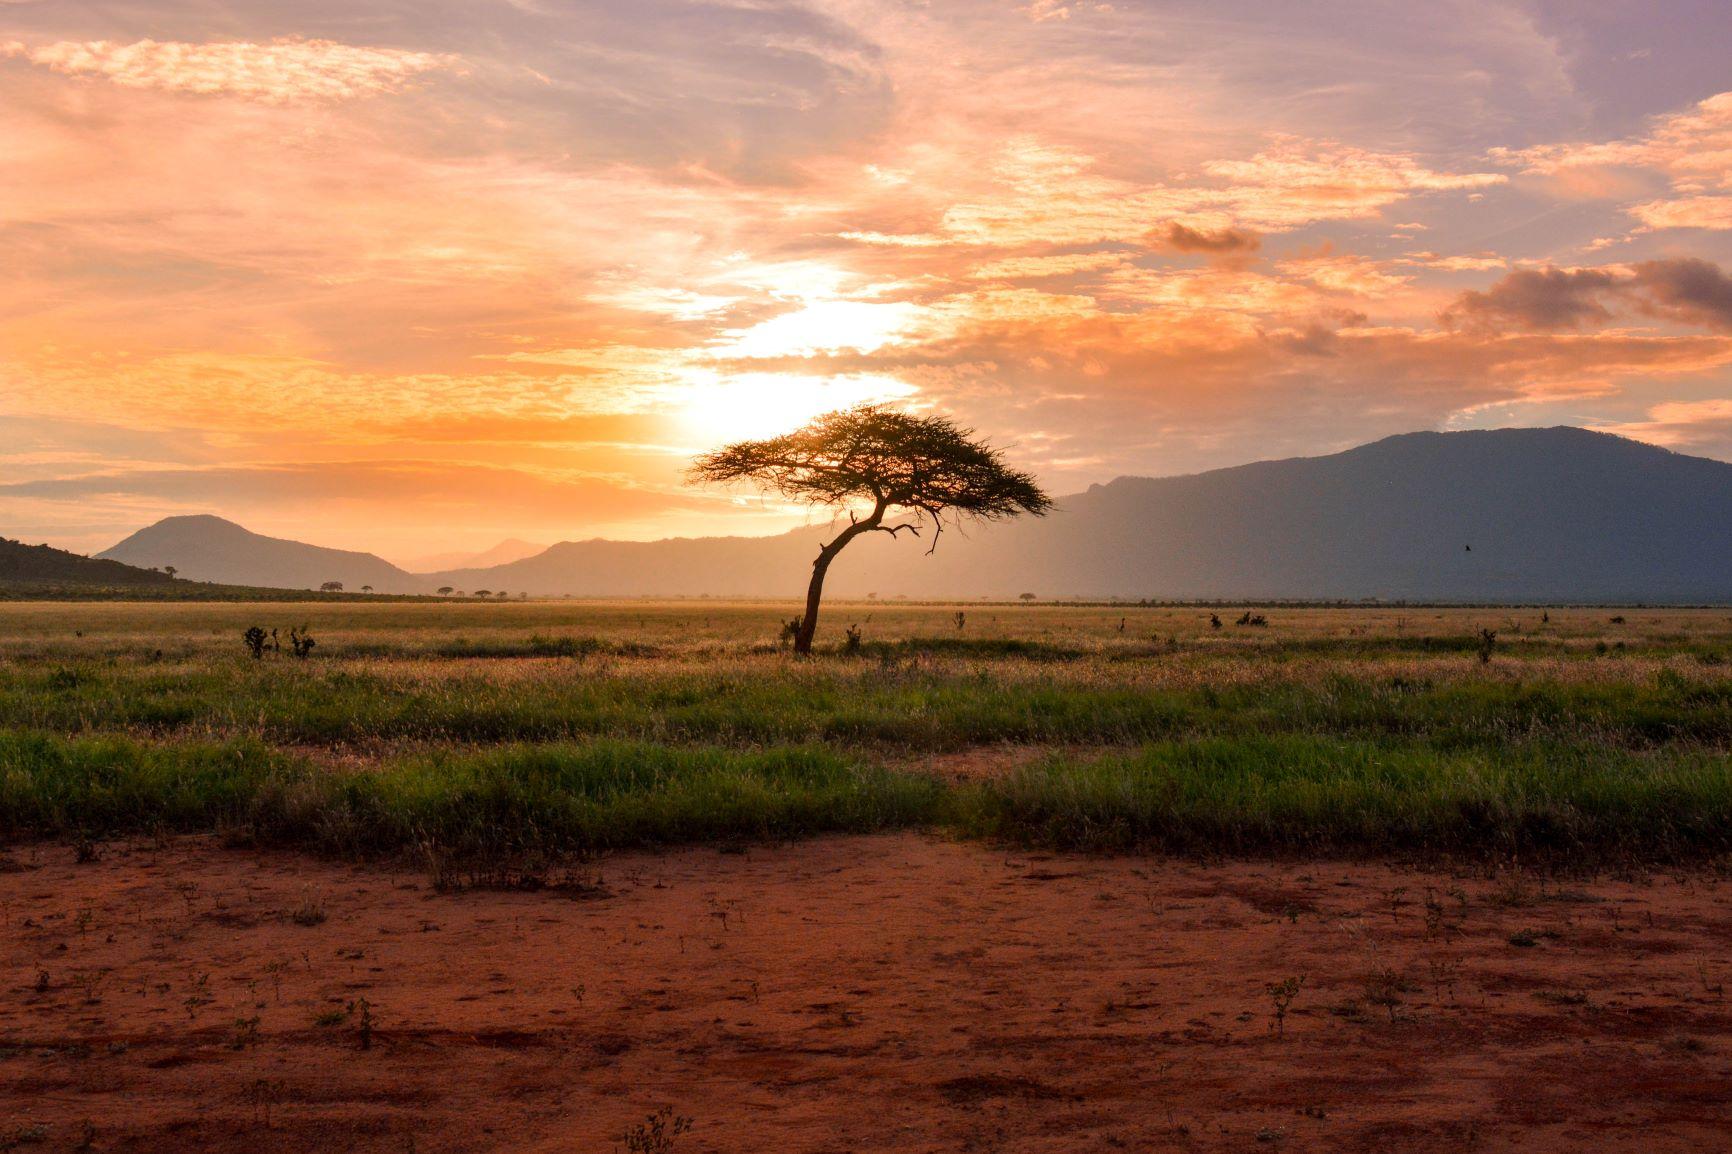 Viaje Kenia y Zanzibar-tsavo-east-national-park